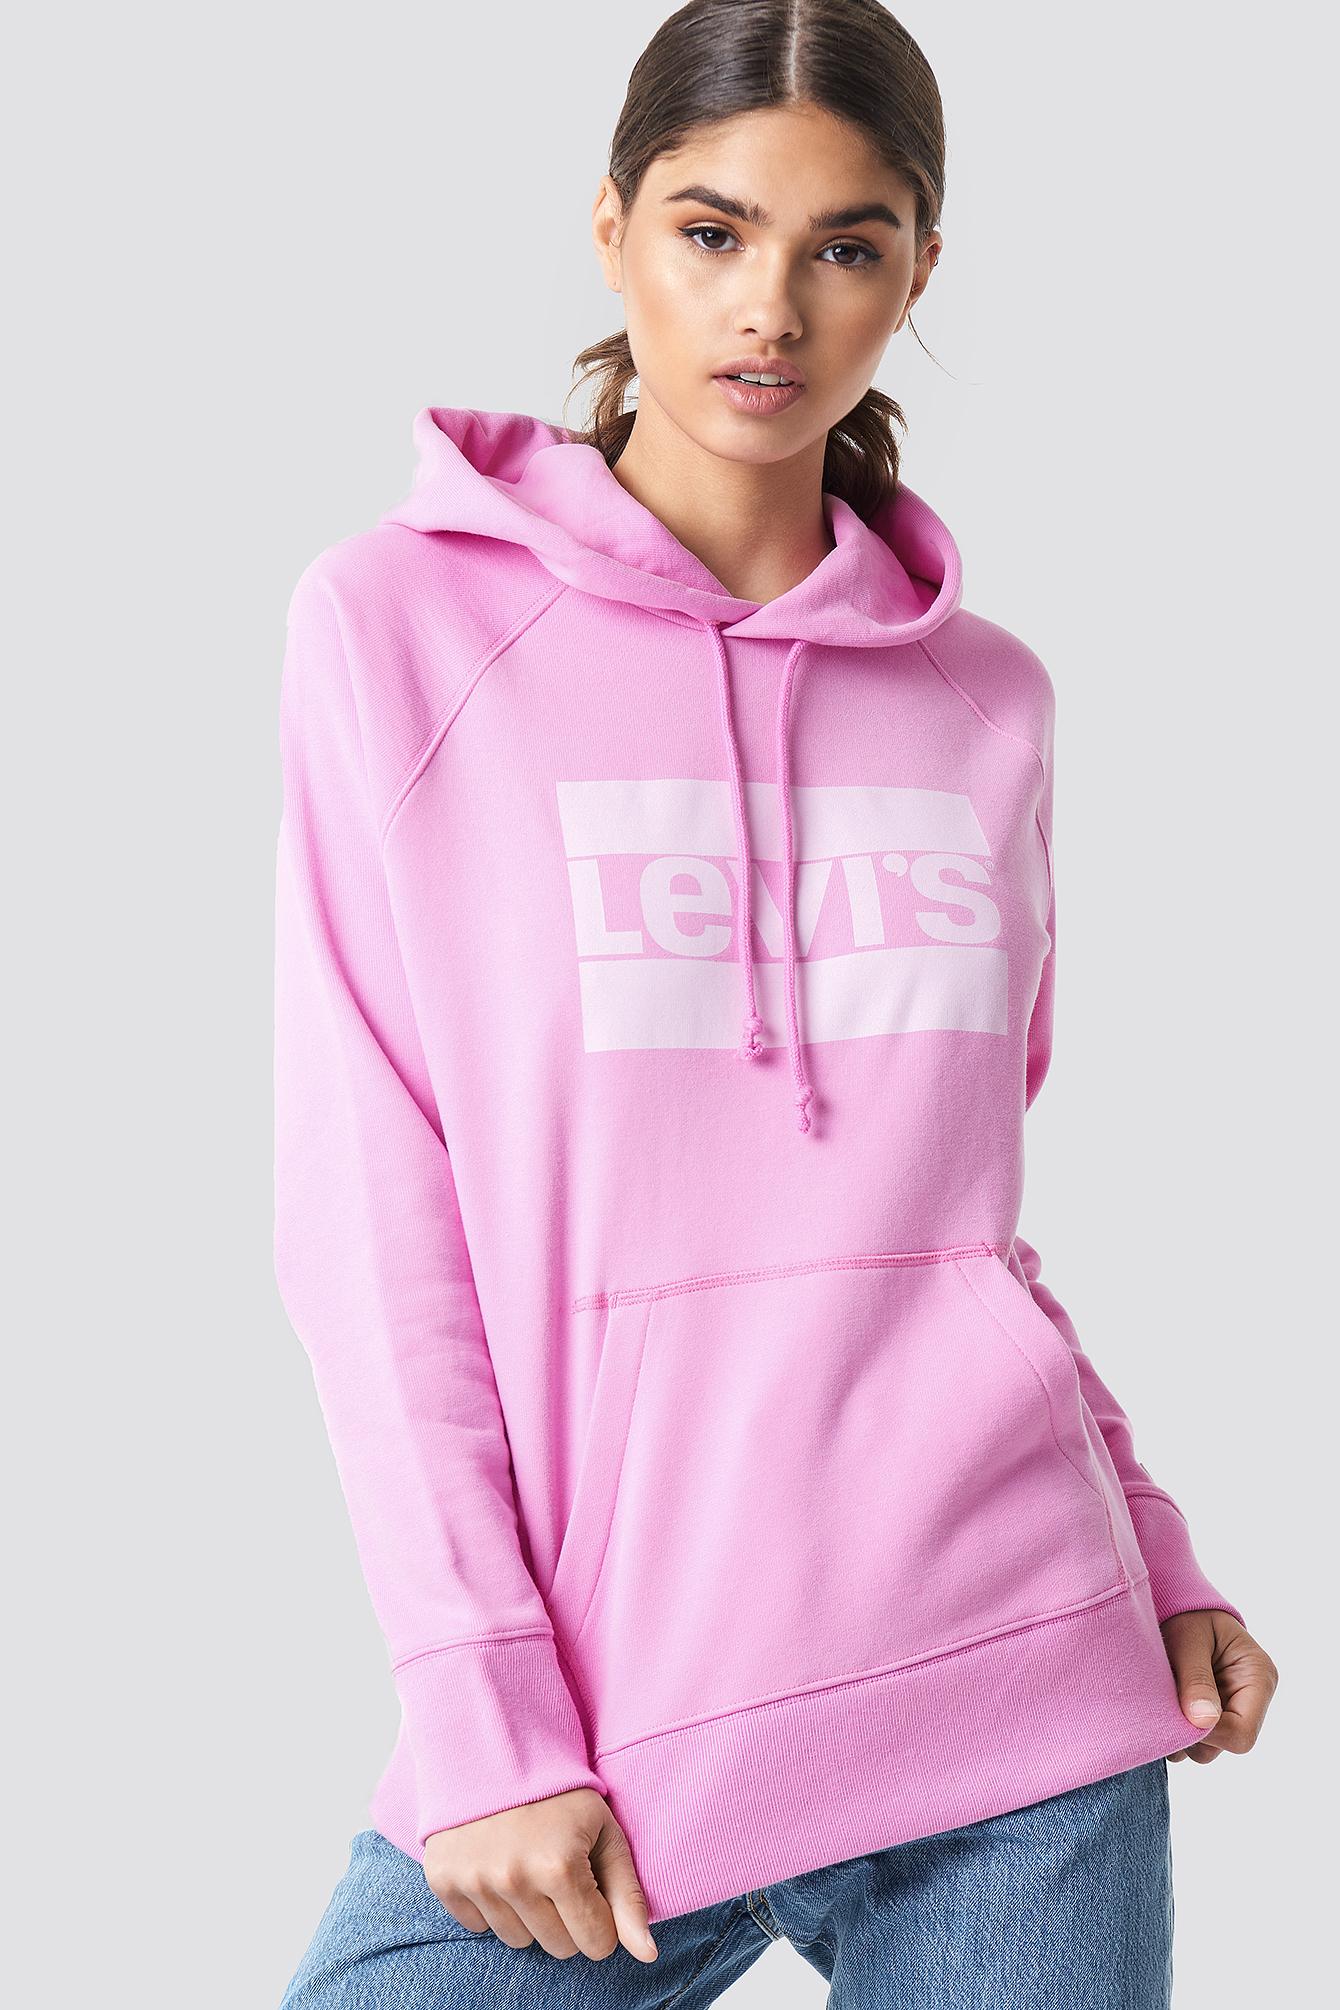 levi's -  Graphic Sportswear Hoodie - Pink